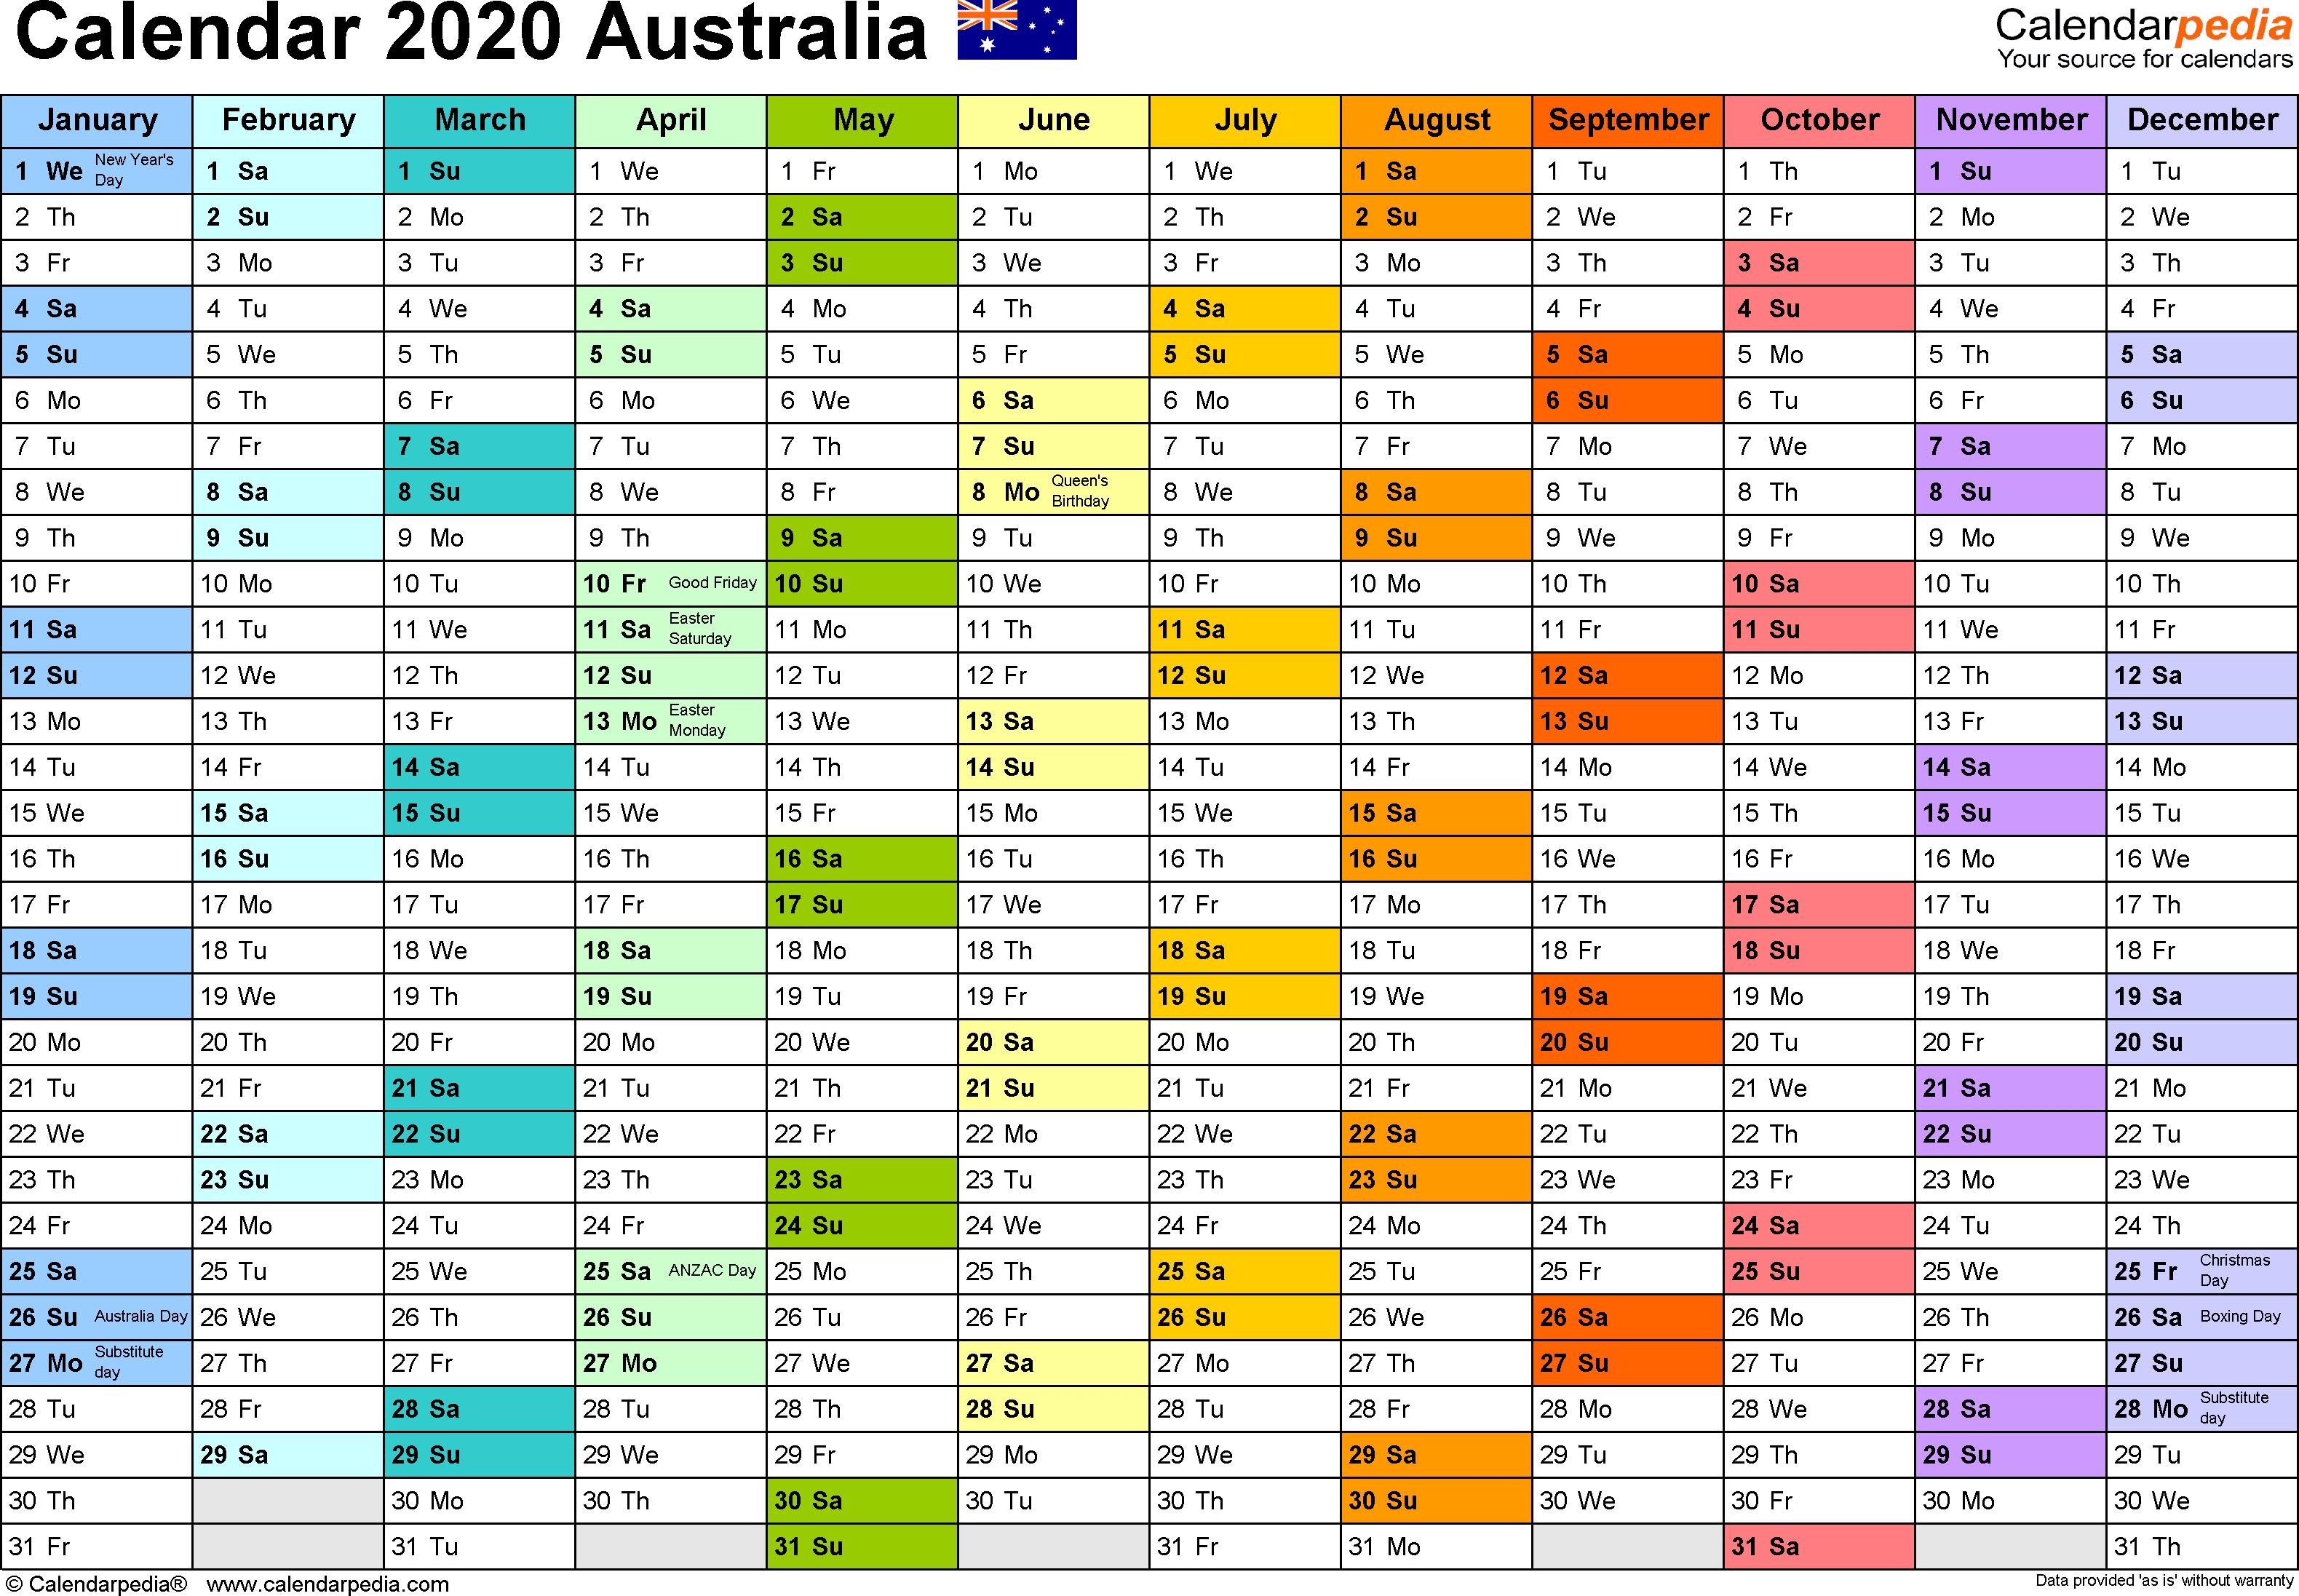 Australia Calendar 2020 - Free Printable Pdf Templates pertaining to Calendar 2020 Australia